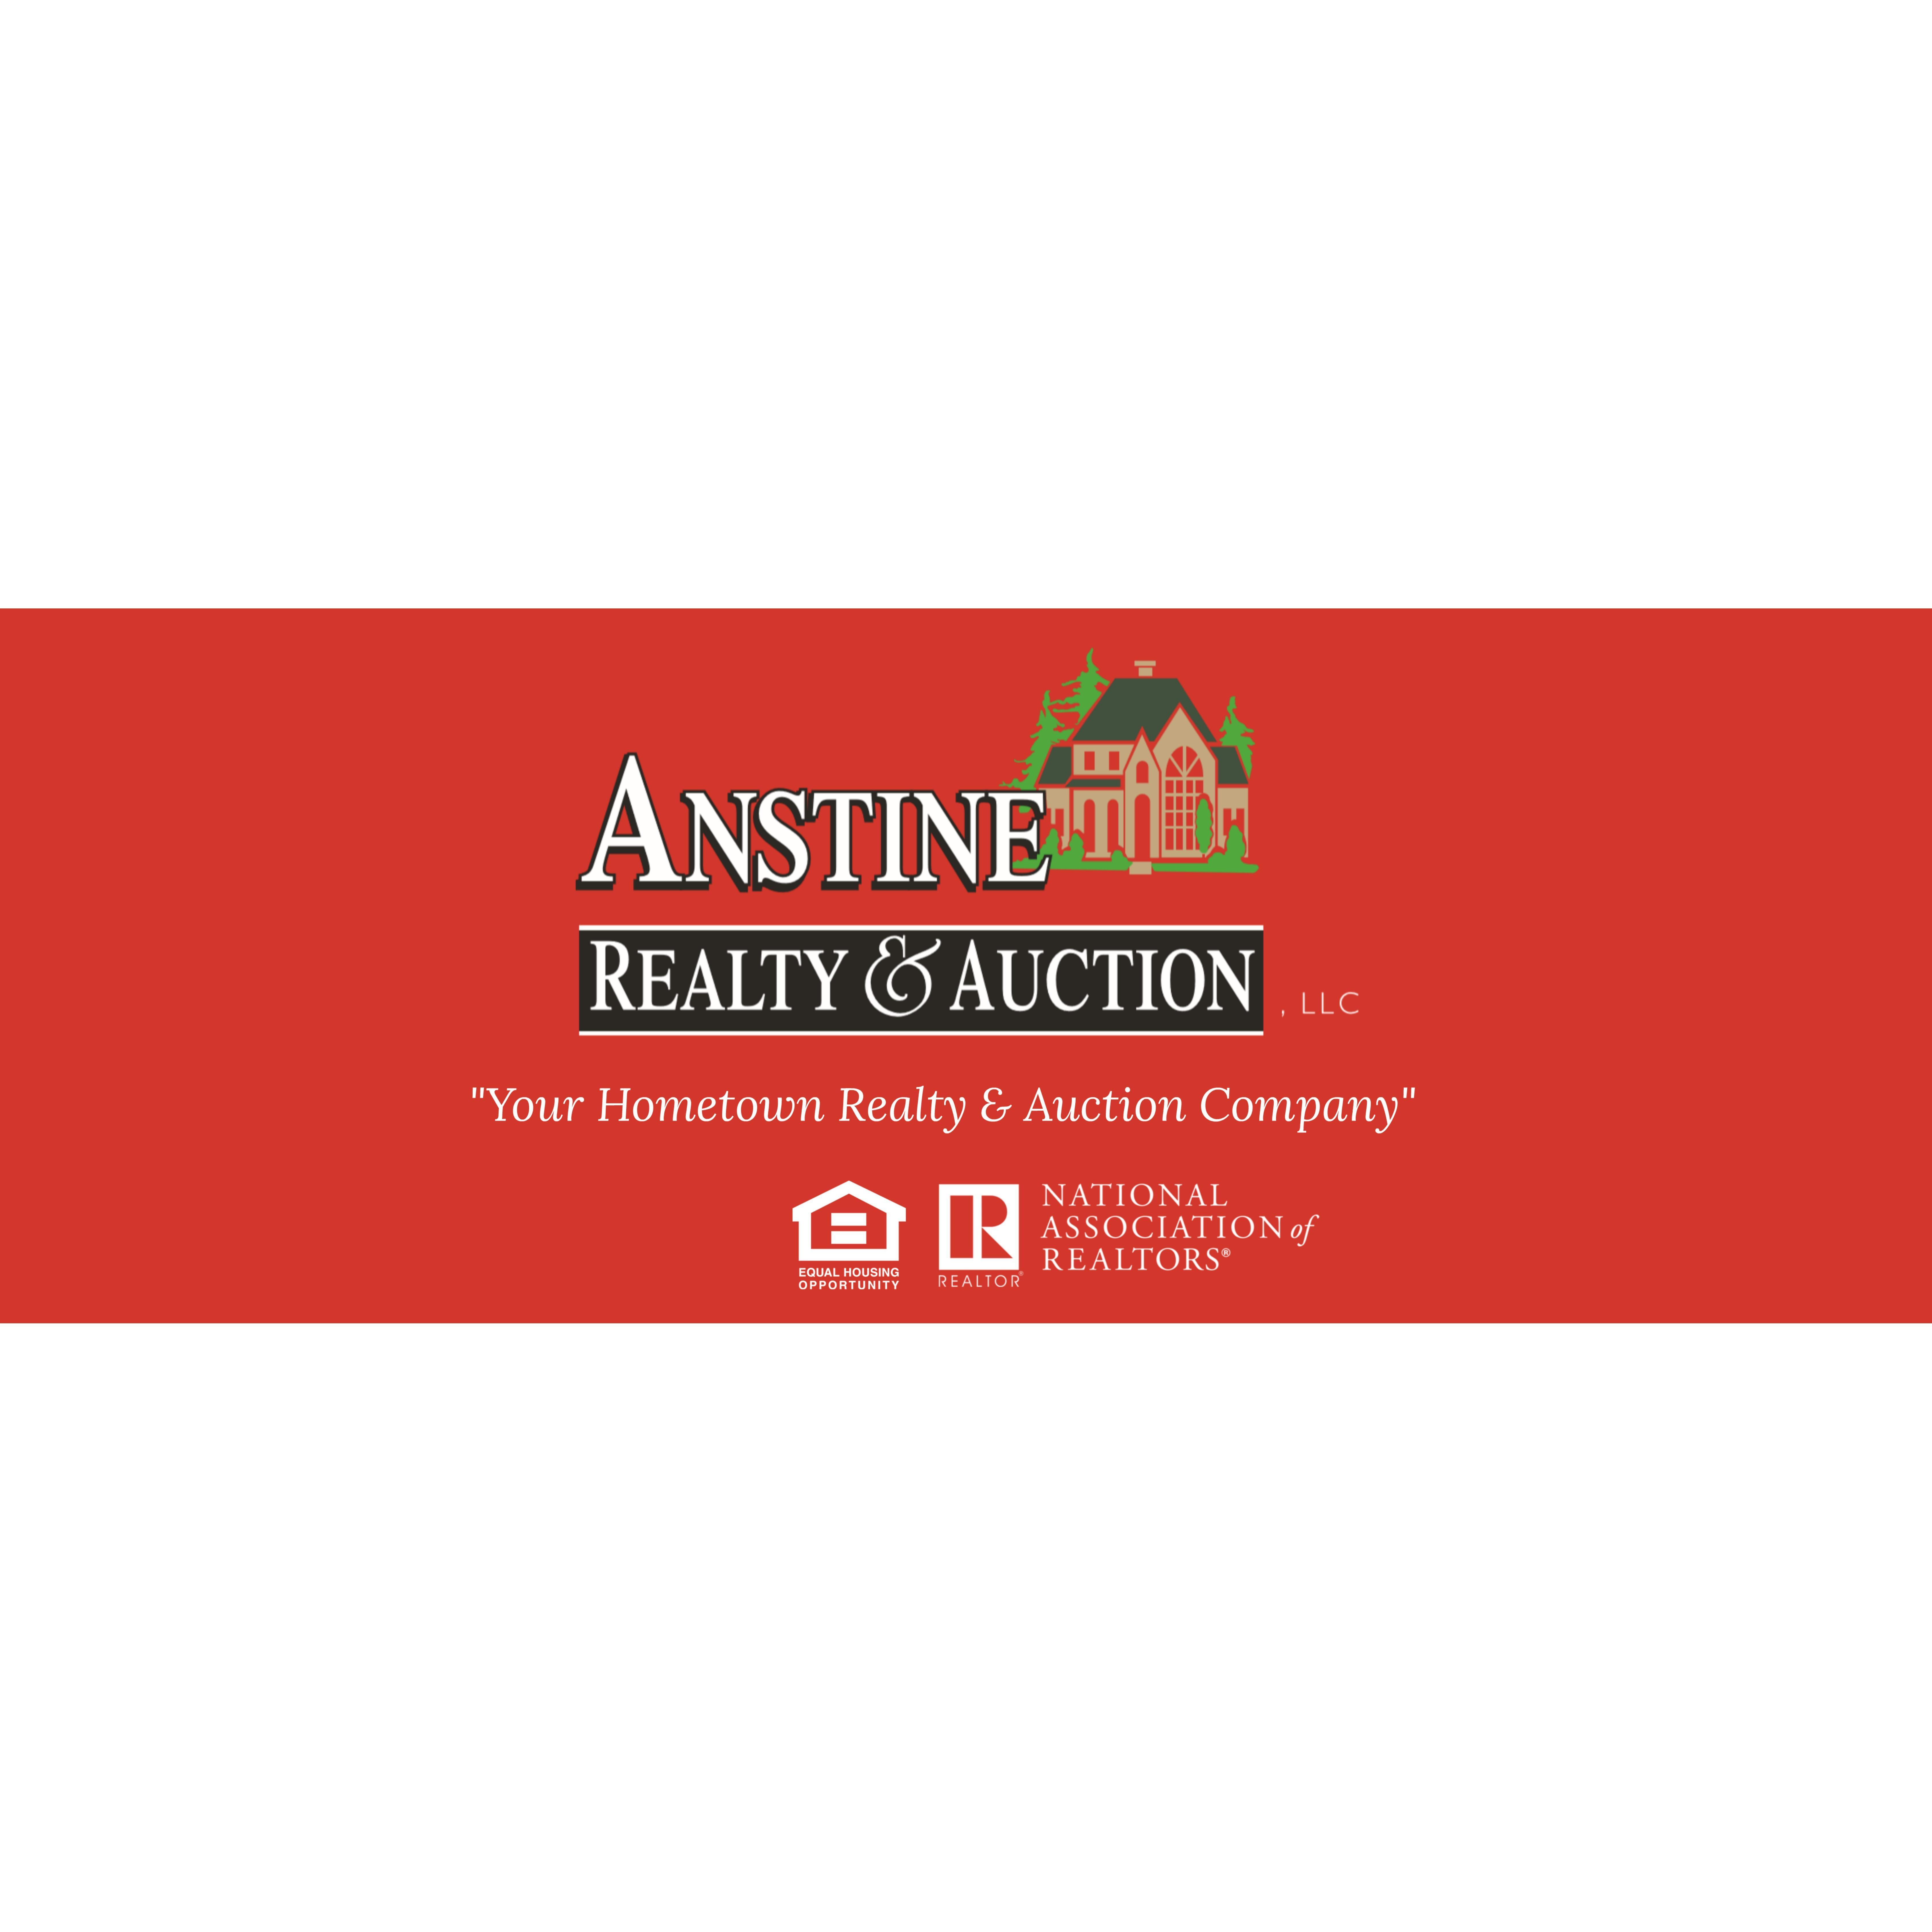 Anstine Realty & Auction, LLC